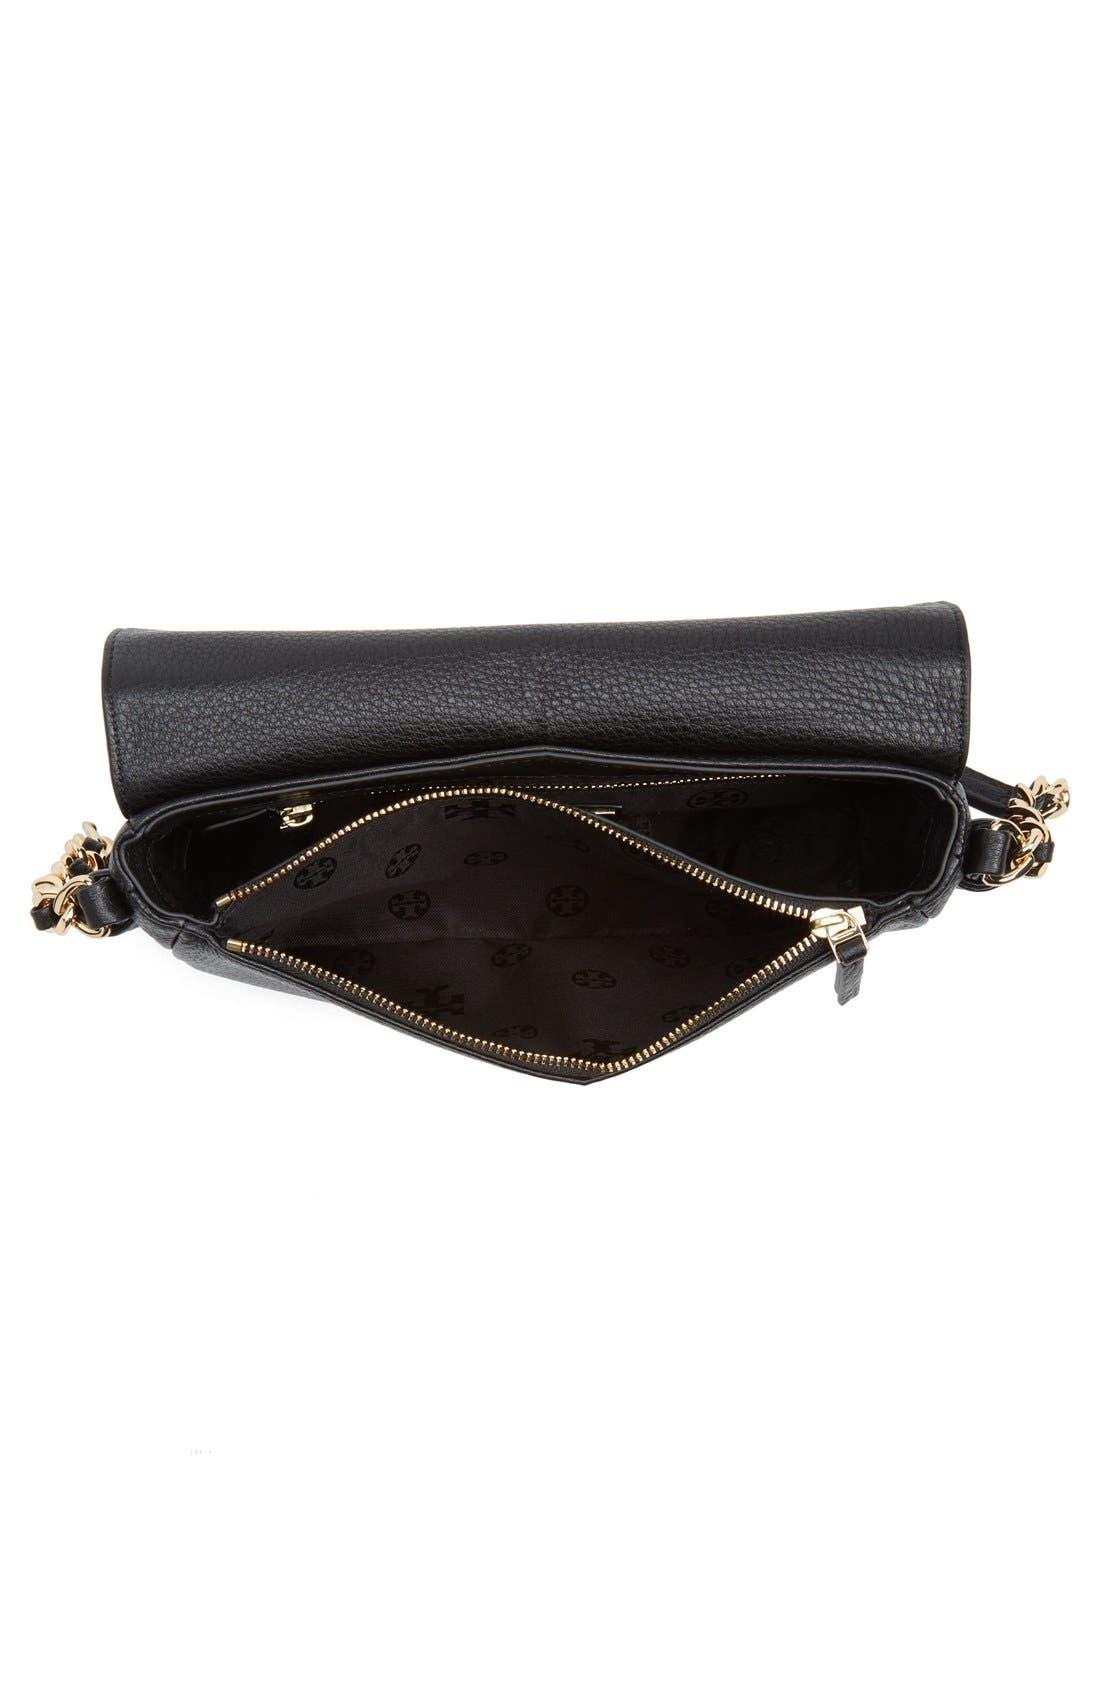 Alternate Image 3  - Tory Burch Mini Harper Leather Crossbody Bag